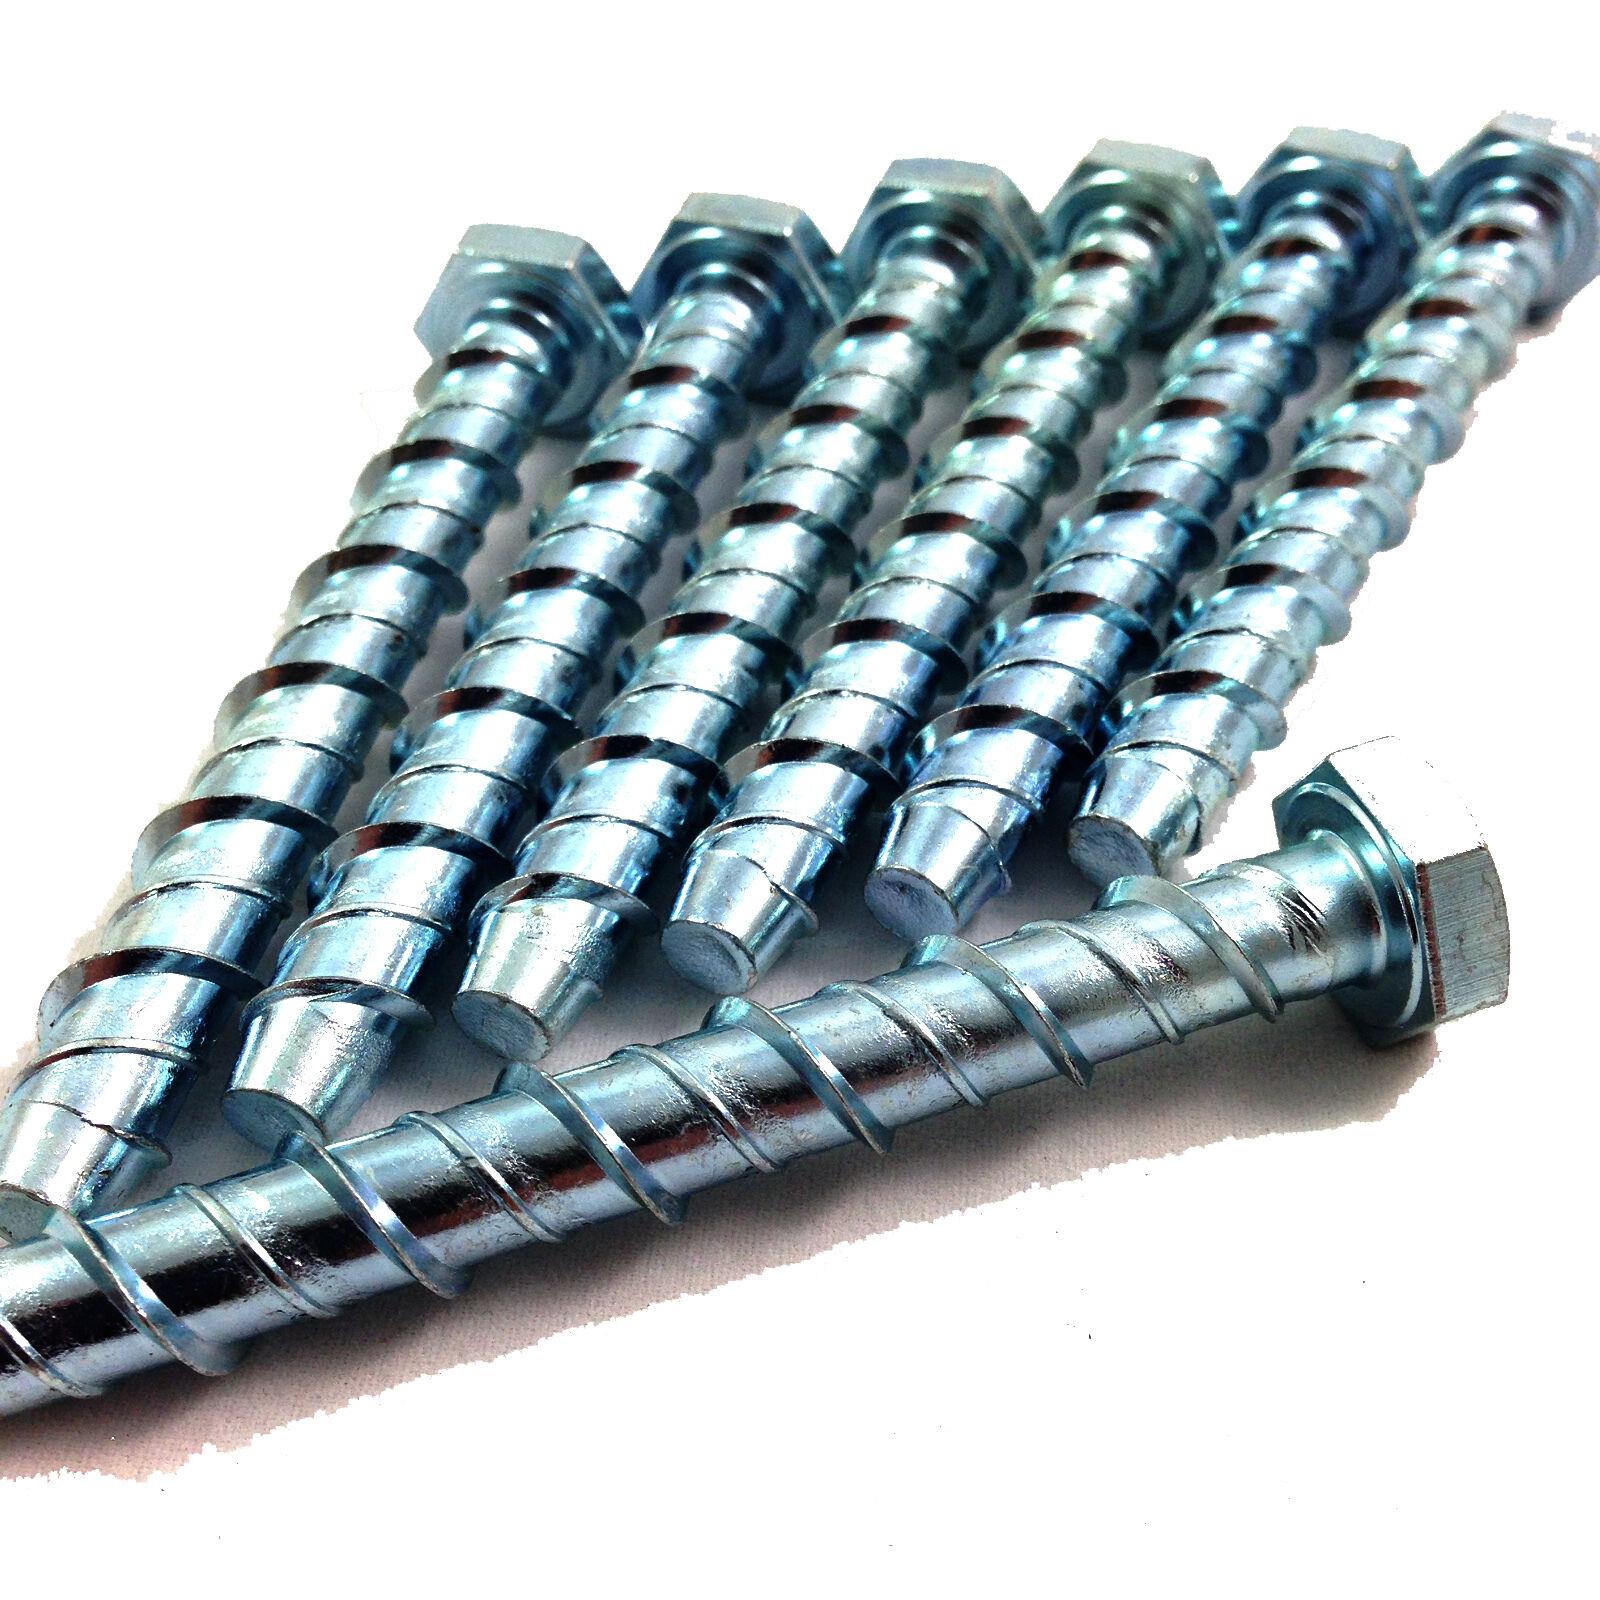 Pack of 10 M6 x 50mm Concrete//Masonry Screw Anchor Hex Head Bolt